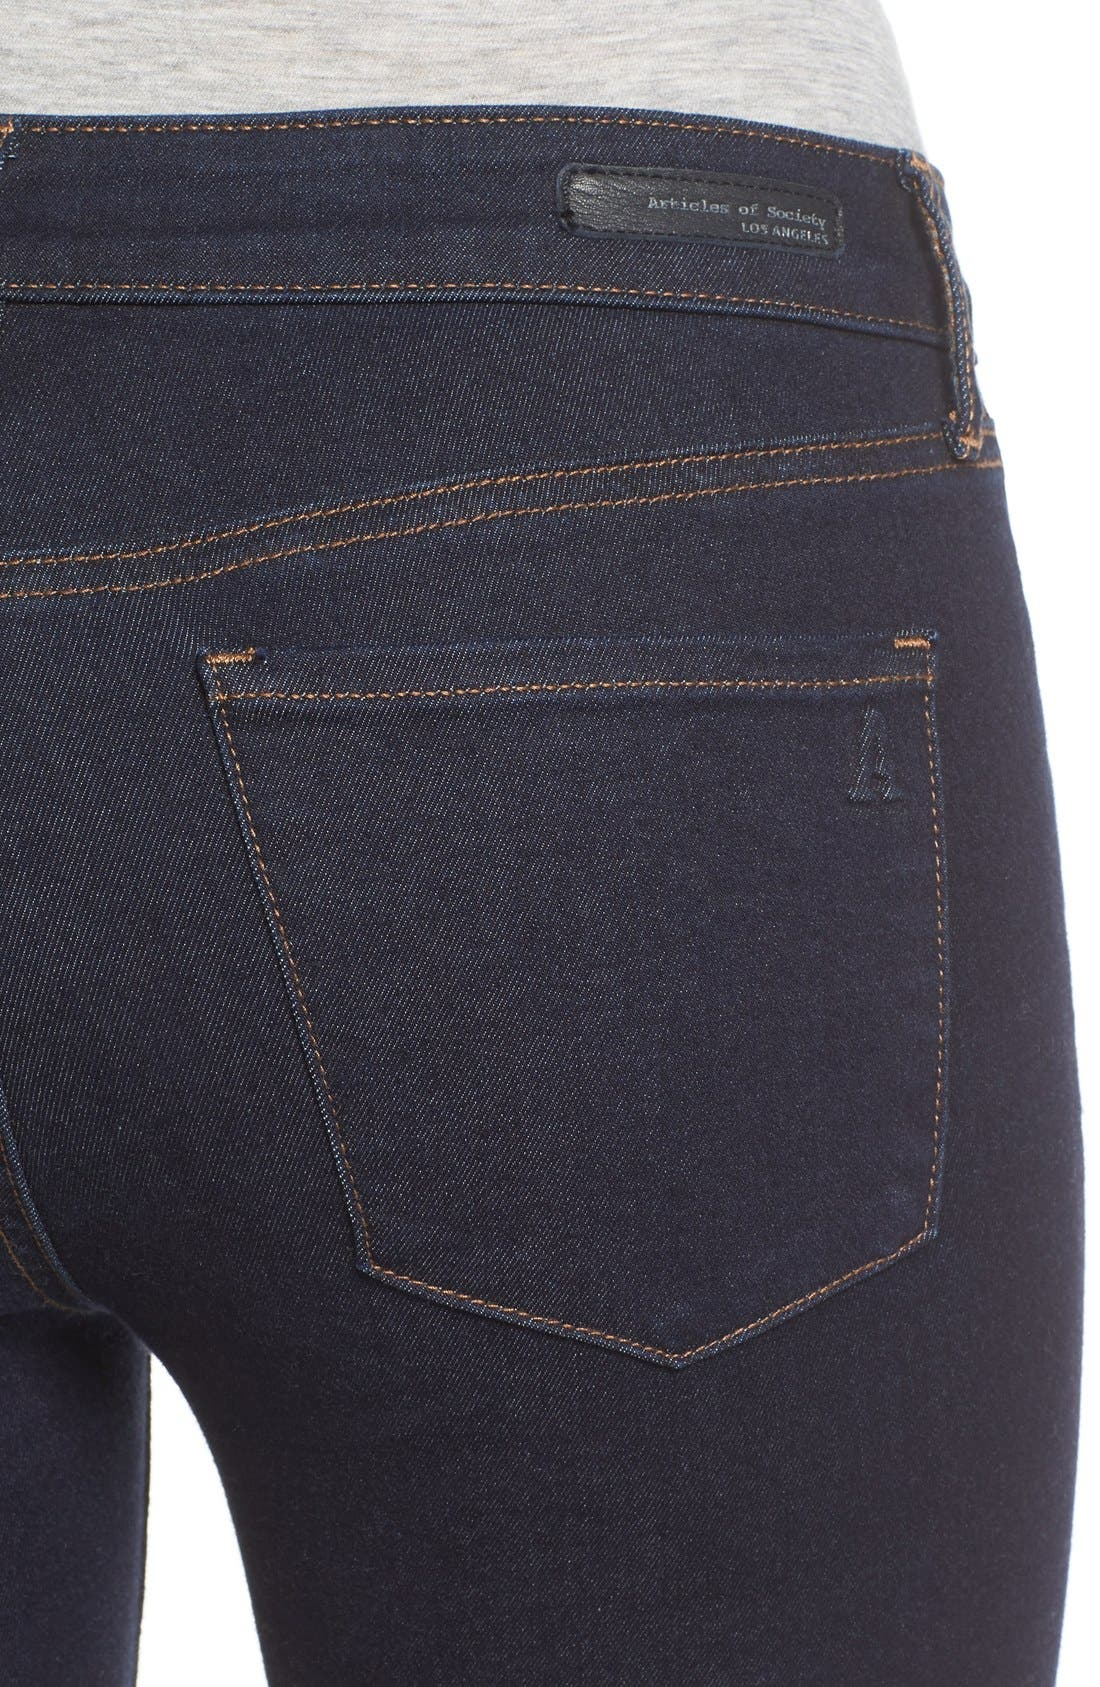 Alternate Image 5  - Articles of Society 'Sarah' Skinny Jeans (Melrose)